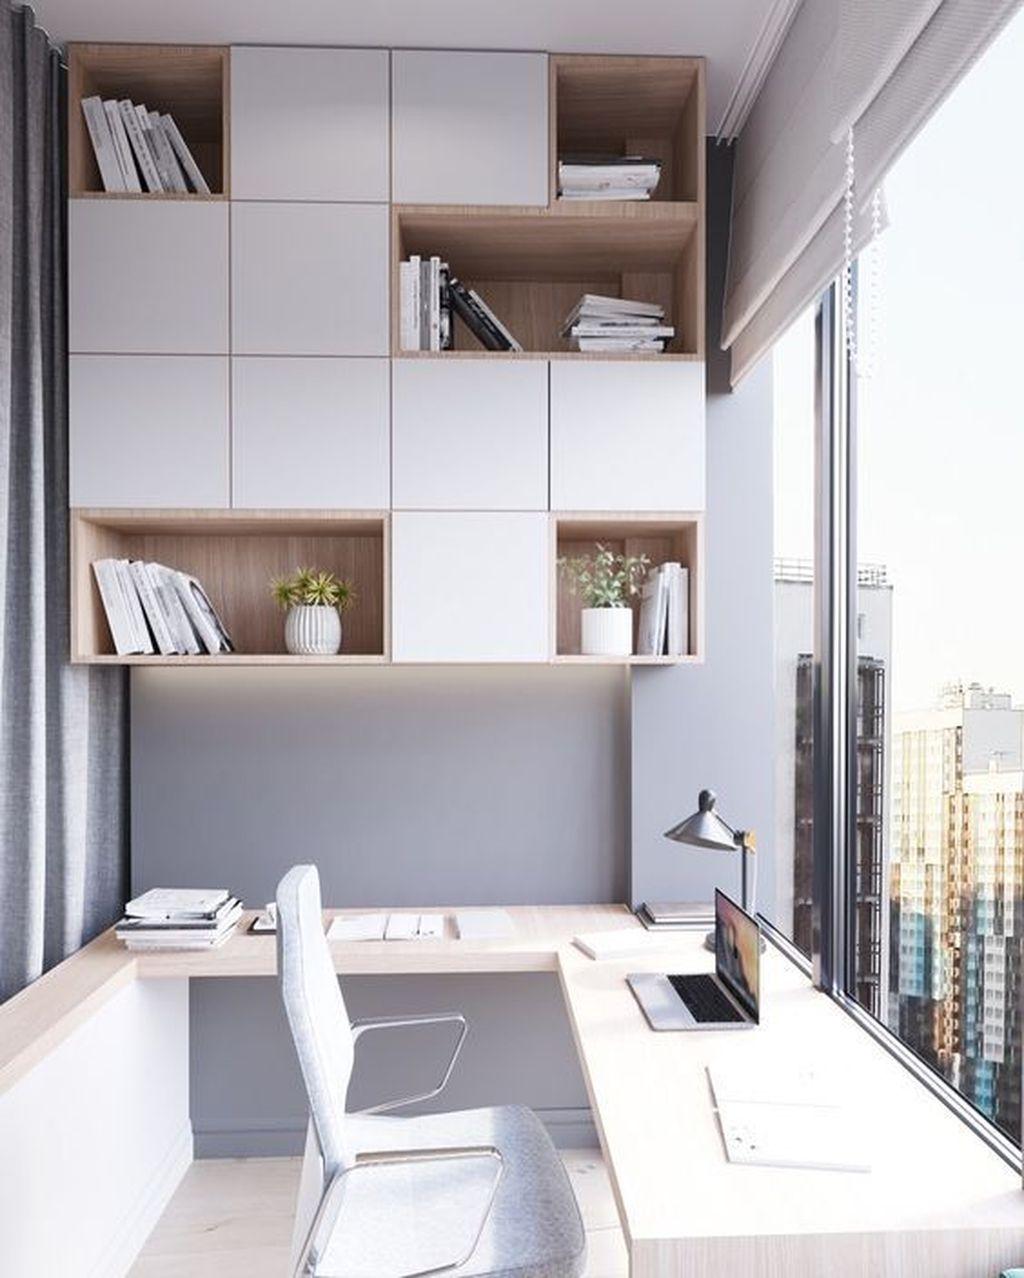 28 The Best Modern Home Office Design Ideas  Home renovation